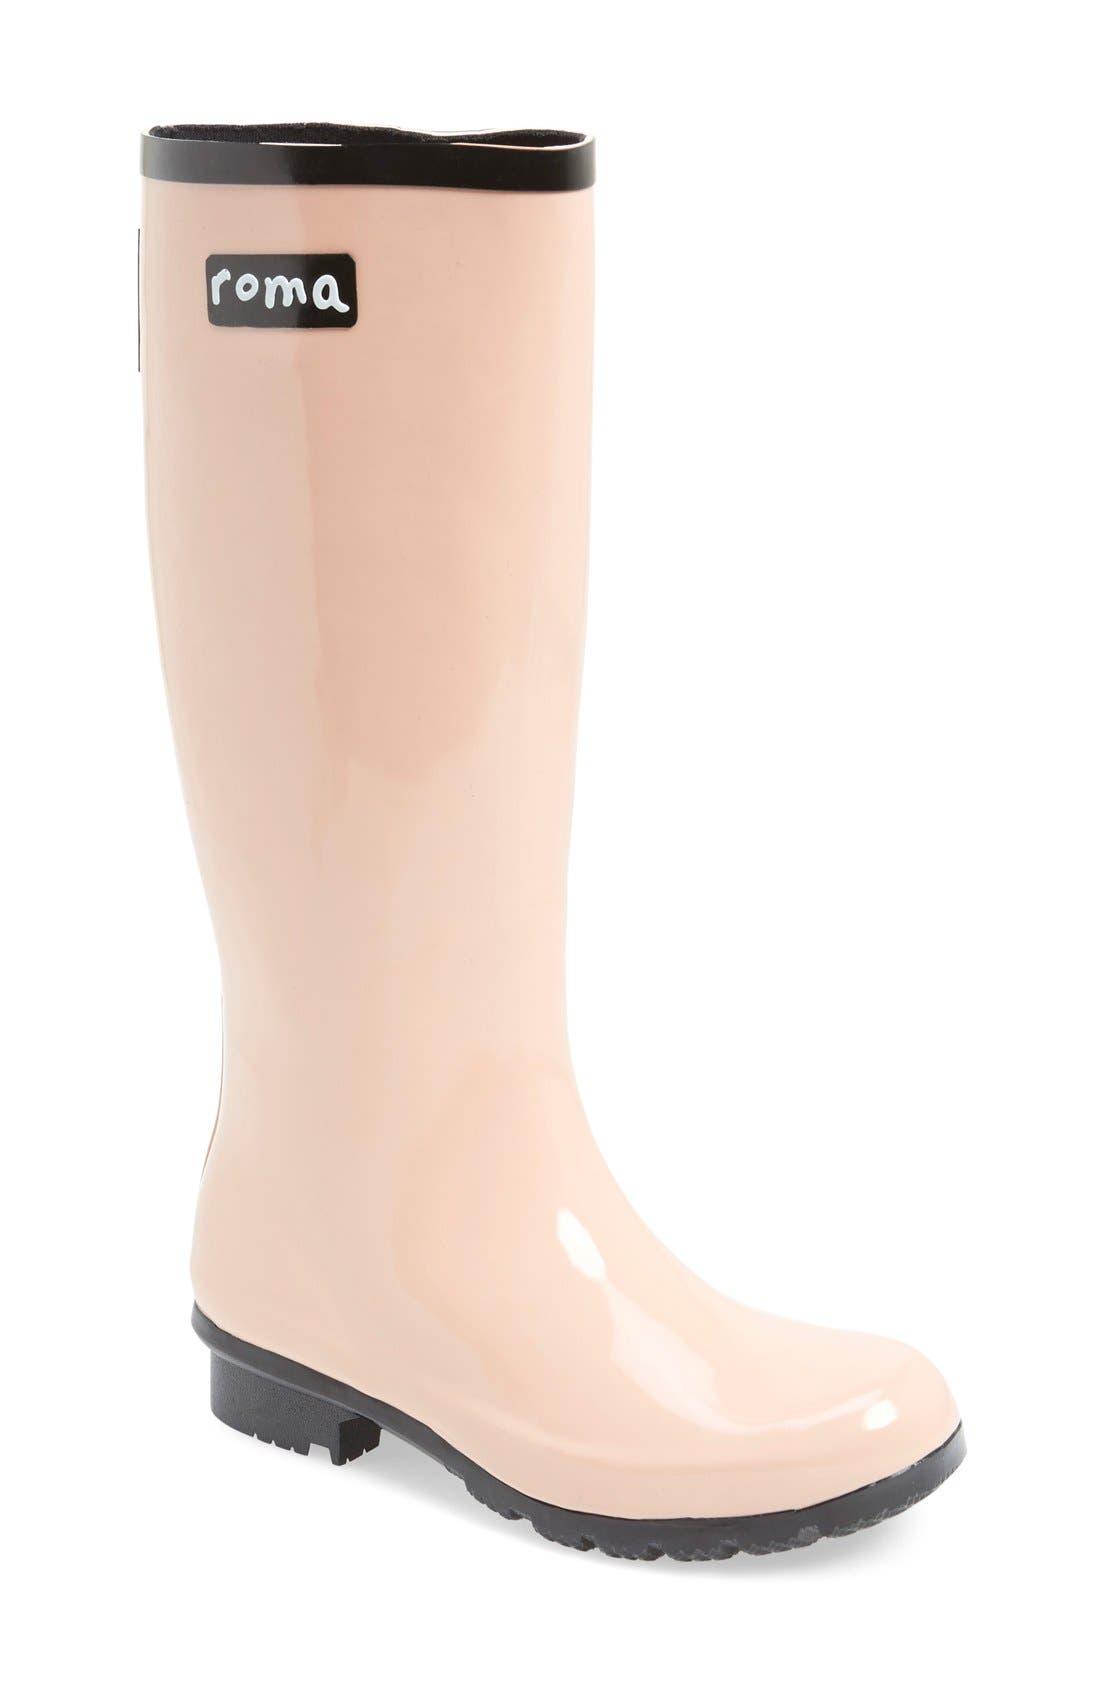 Alternate Image 1 Selected - roma 'Emma' Glossy Rain Boot (Women)